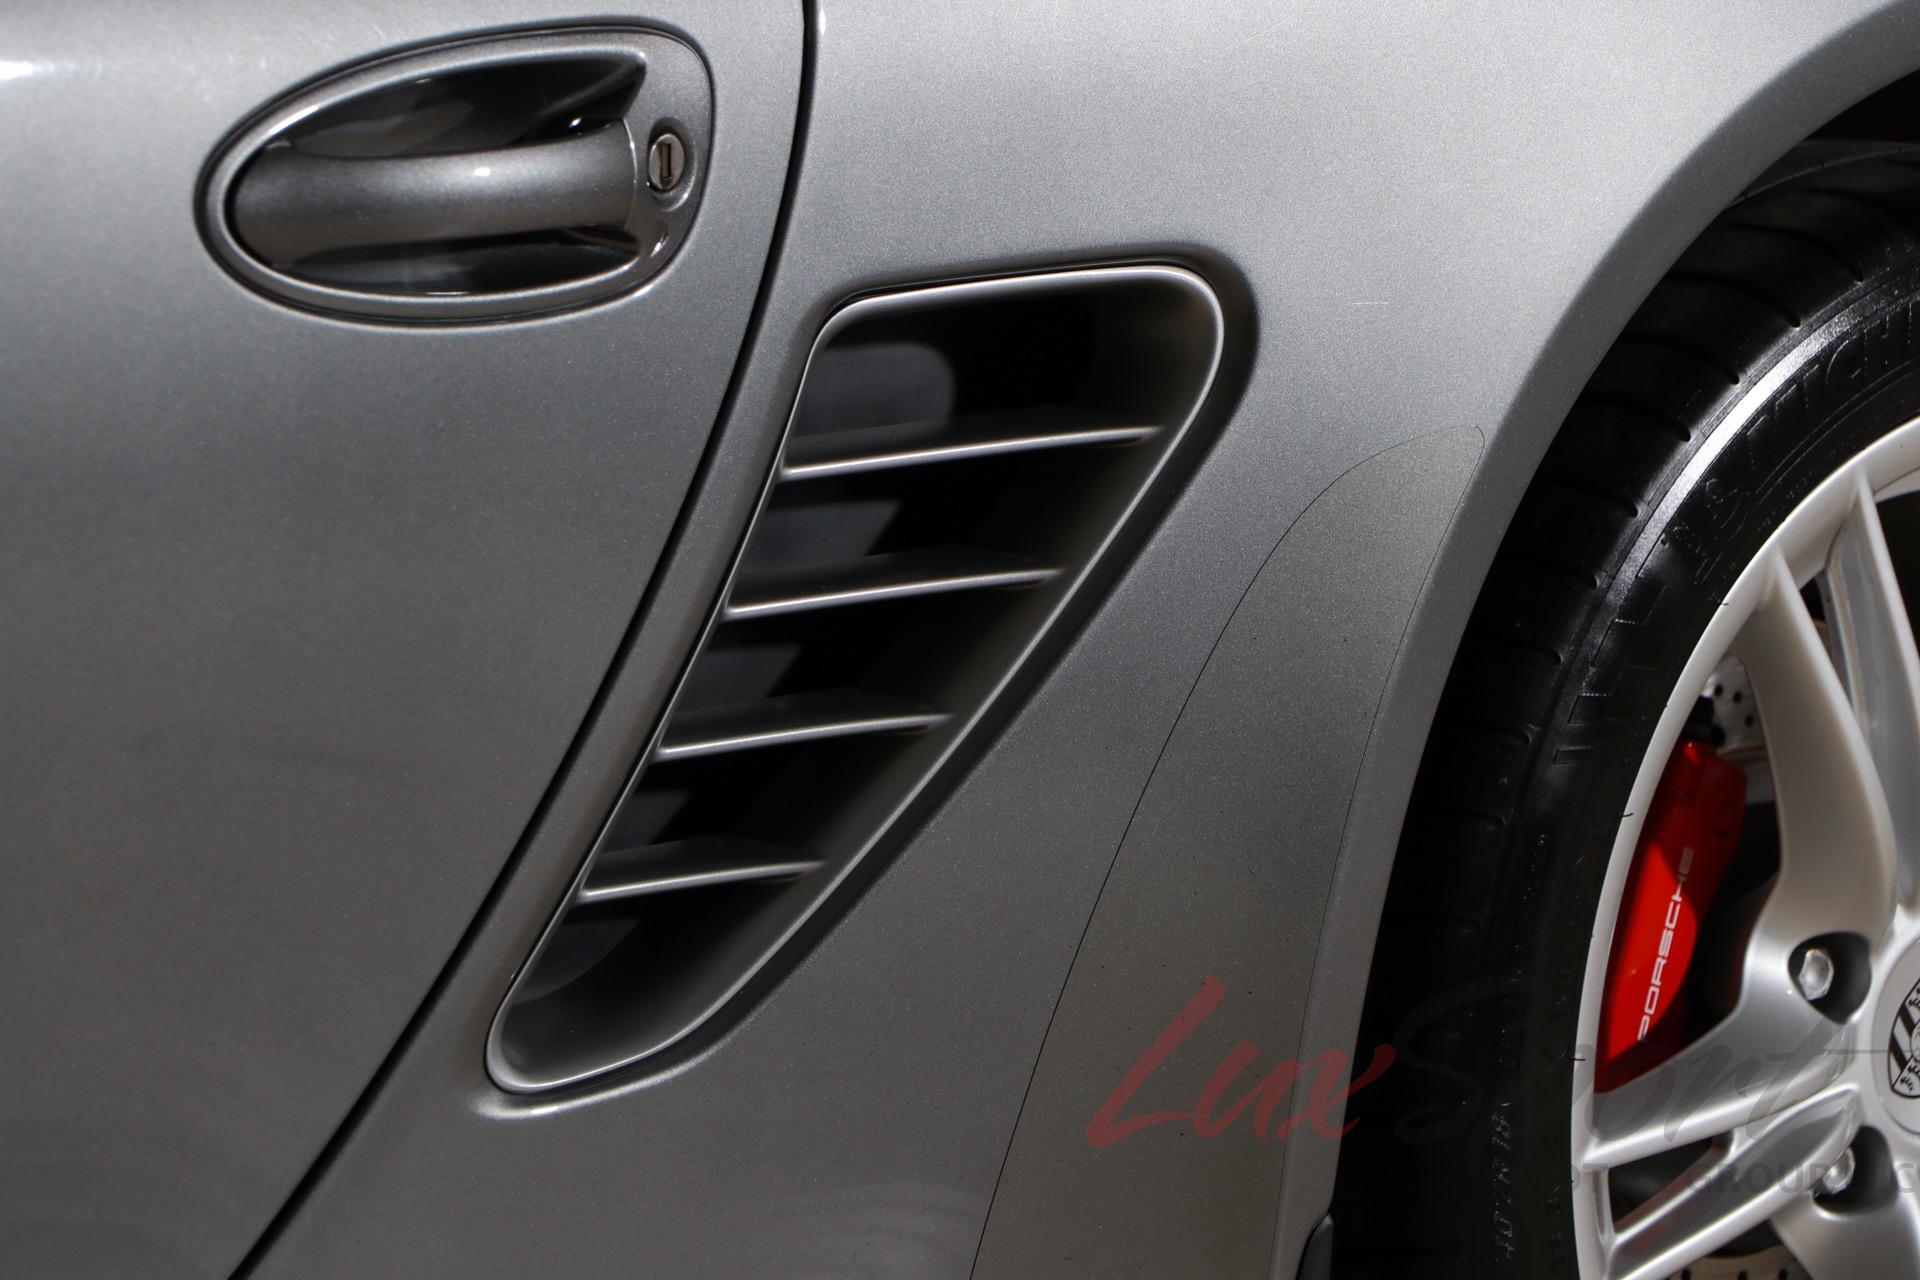 Used 2009 Porsche Boxster S | Syosset, NY